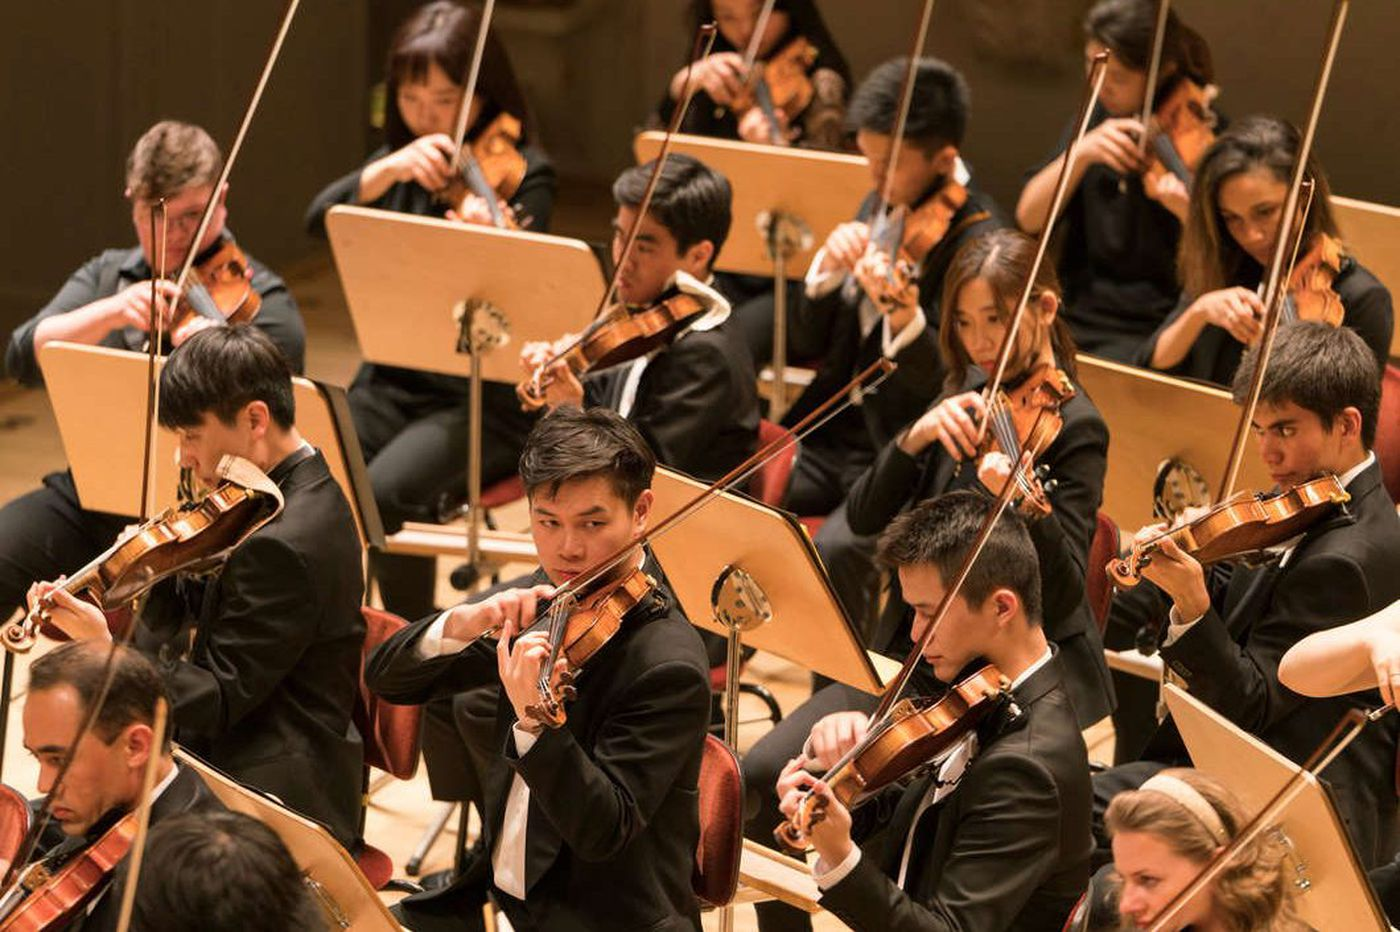 Classical concerts in Philadelphia: Lawrence Brownlee, Sonya Yoncheva, Mirga Grazinyte-Tyla, more